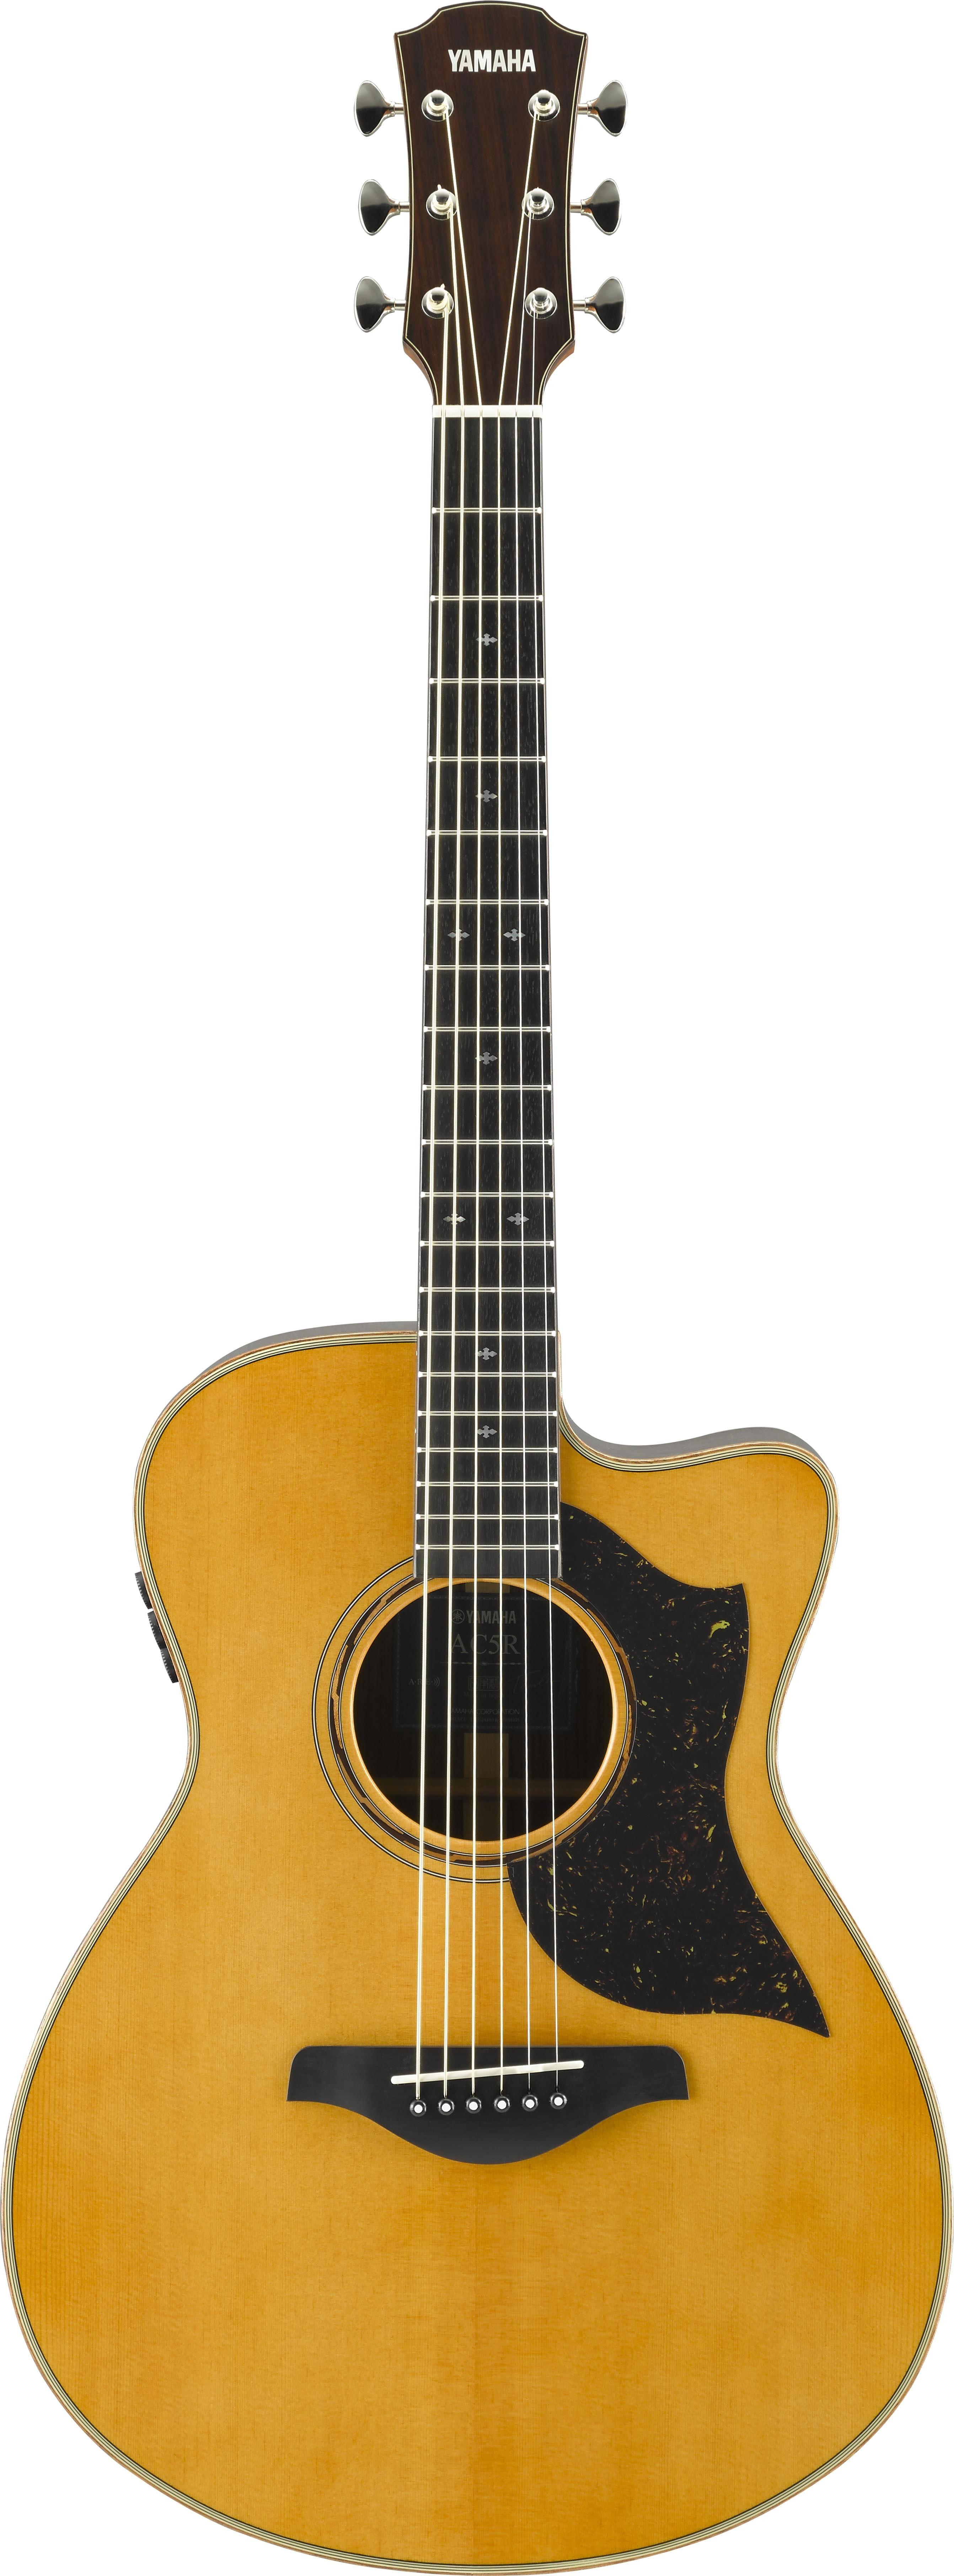 A R E Yamaha Guitars